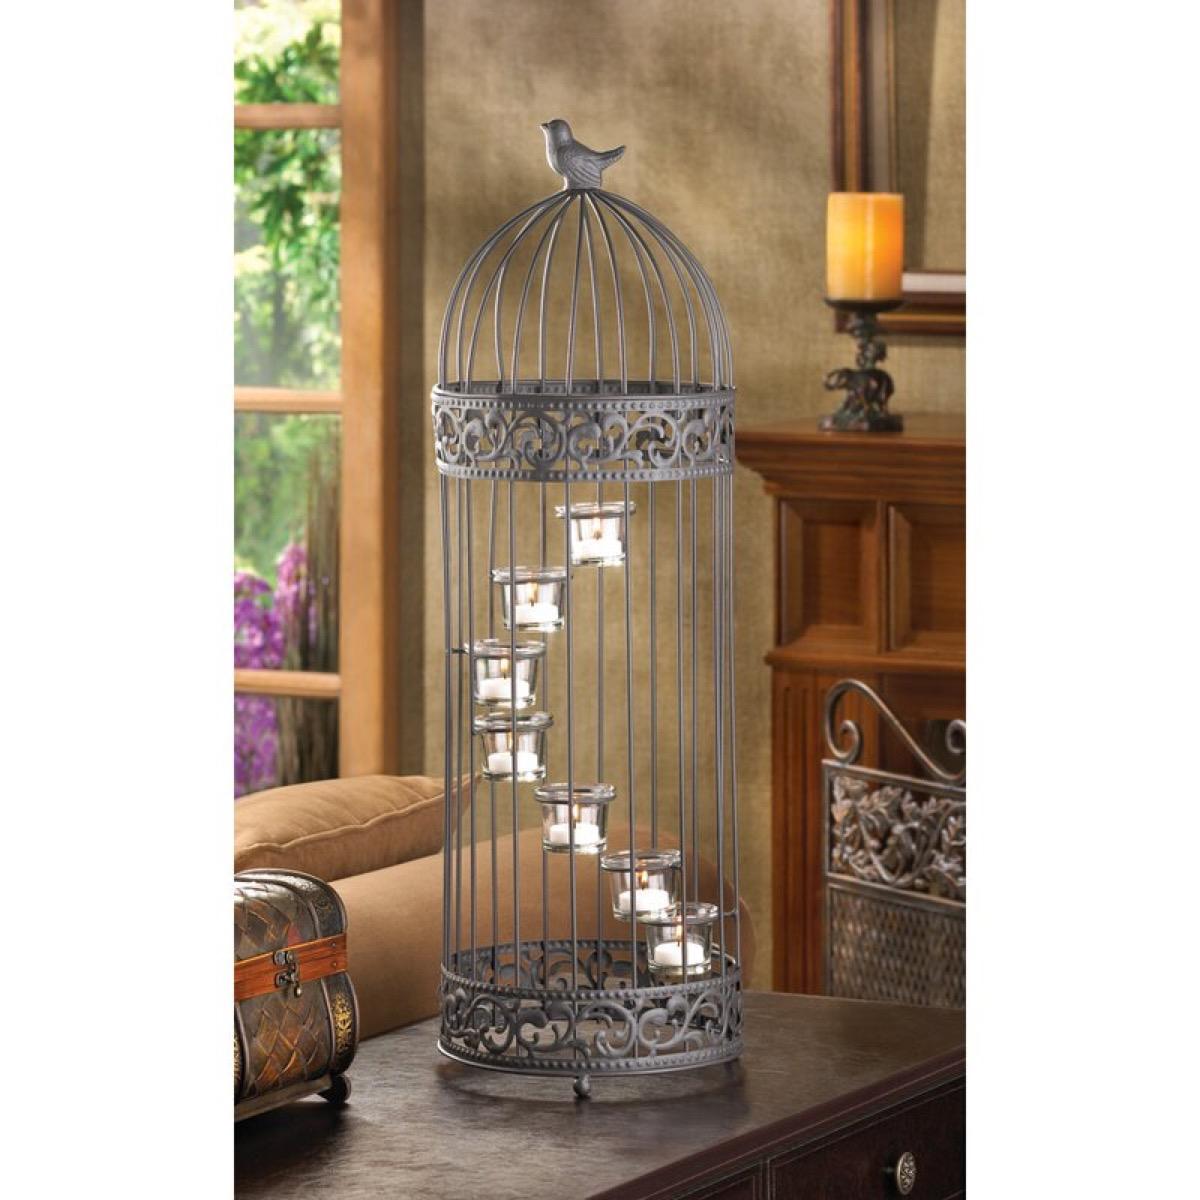 metal birdcage with fairy lights, rustic farmhouse decor